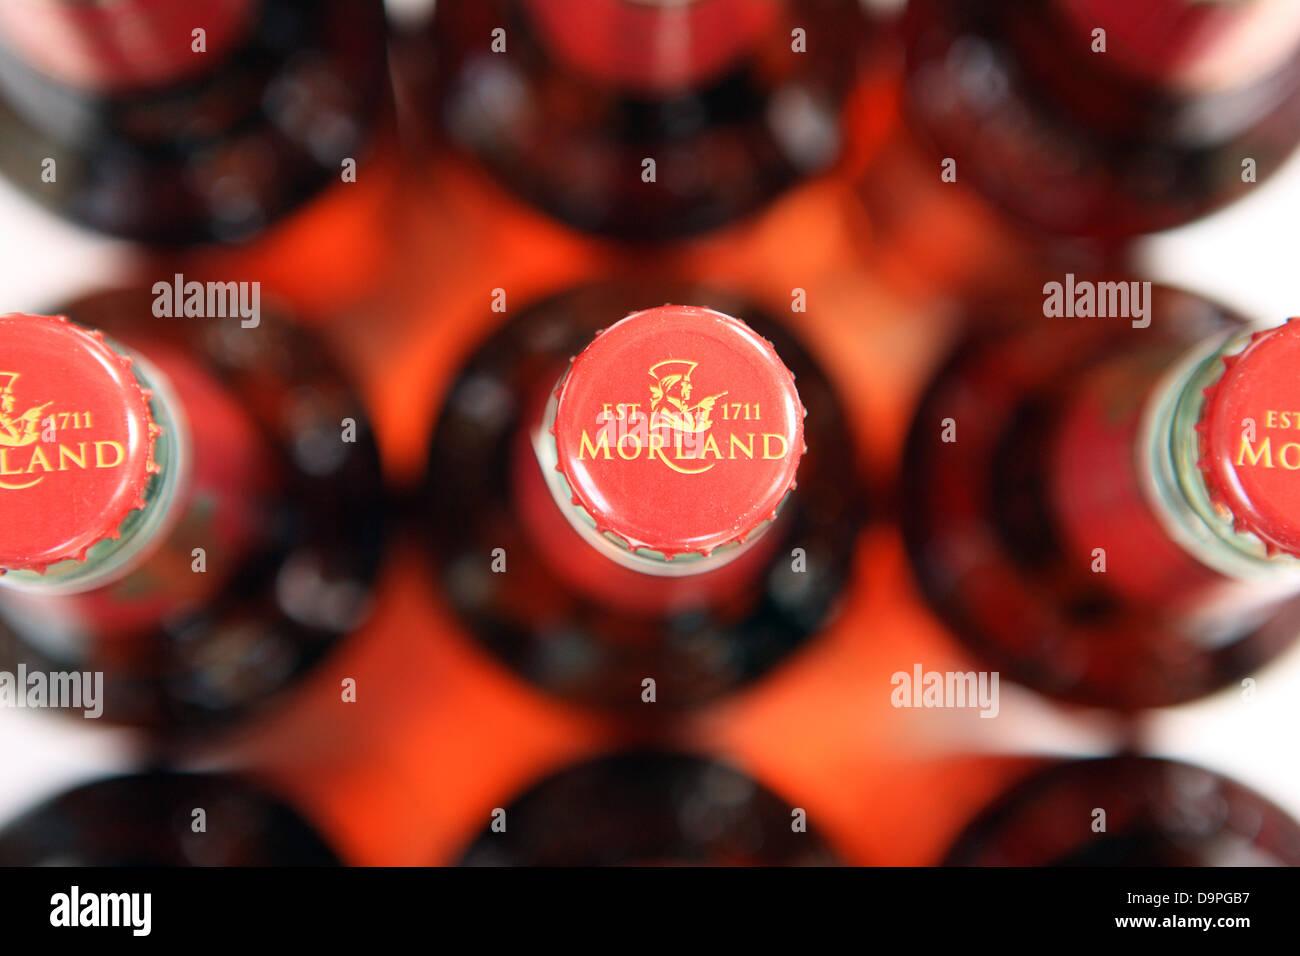 Morland beer bottle caps - Stock Image